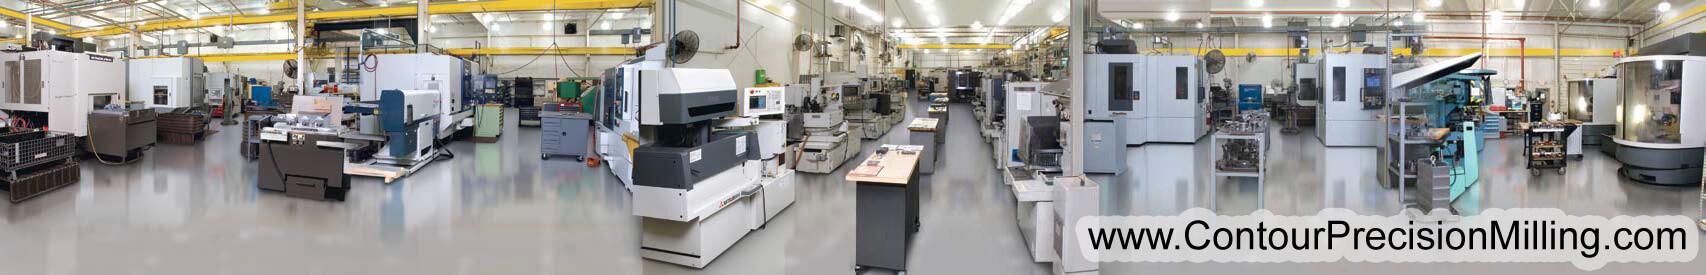 Contour Tool Facility